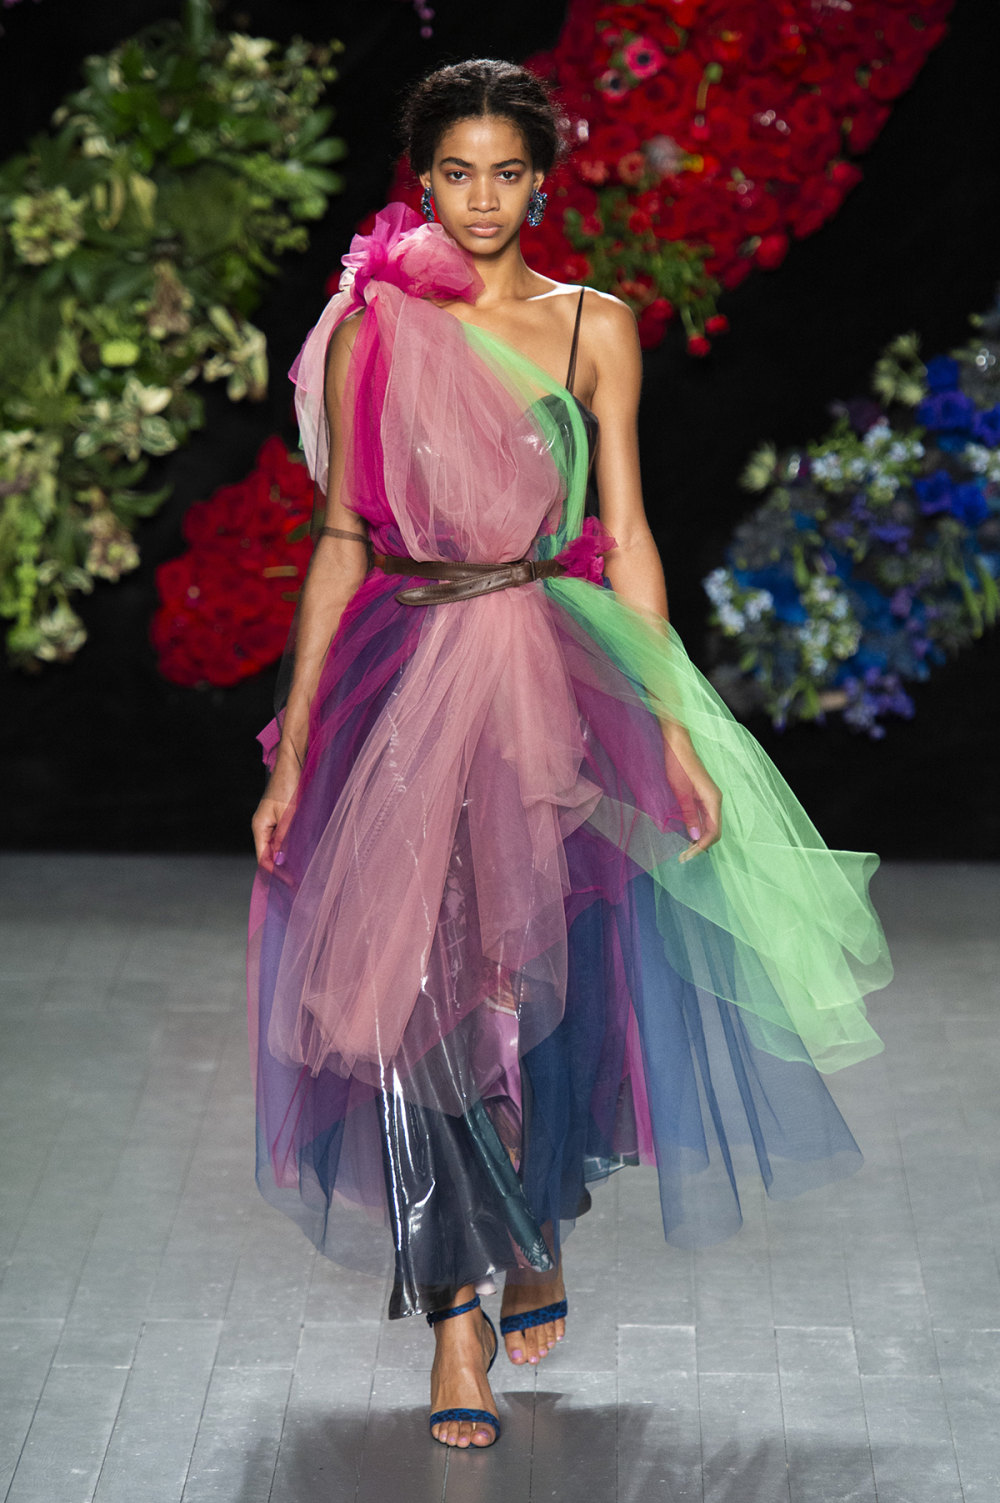 Roberta Einer时装系列格子呢西装外套收紧腰部霓虹色腰带连帽衫-27.jpg